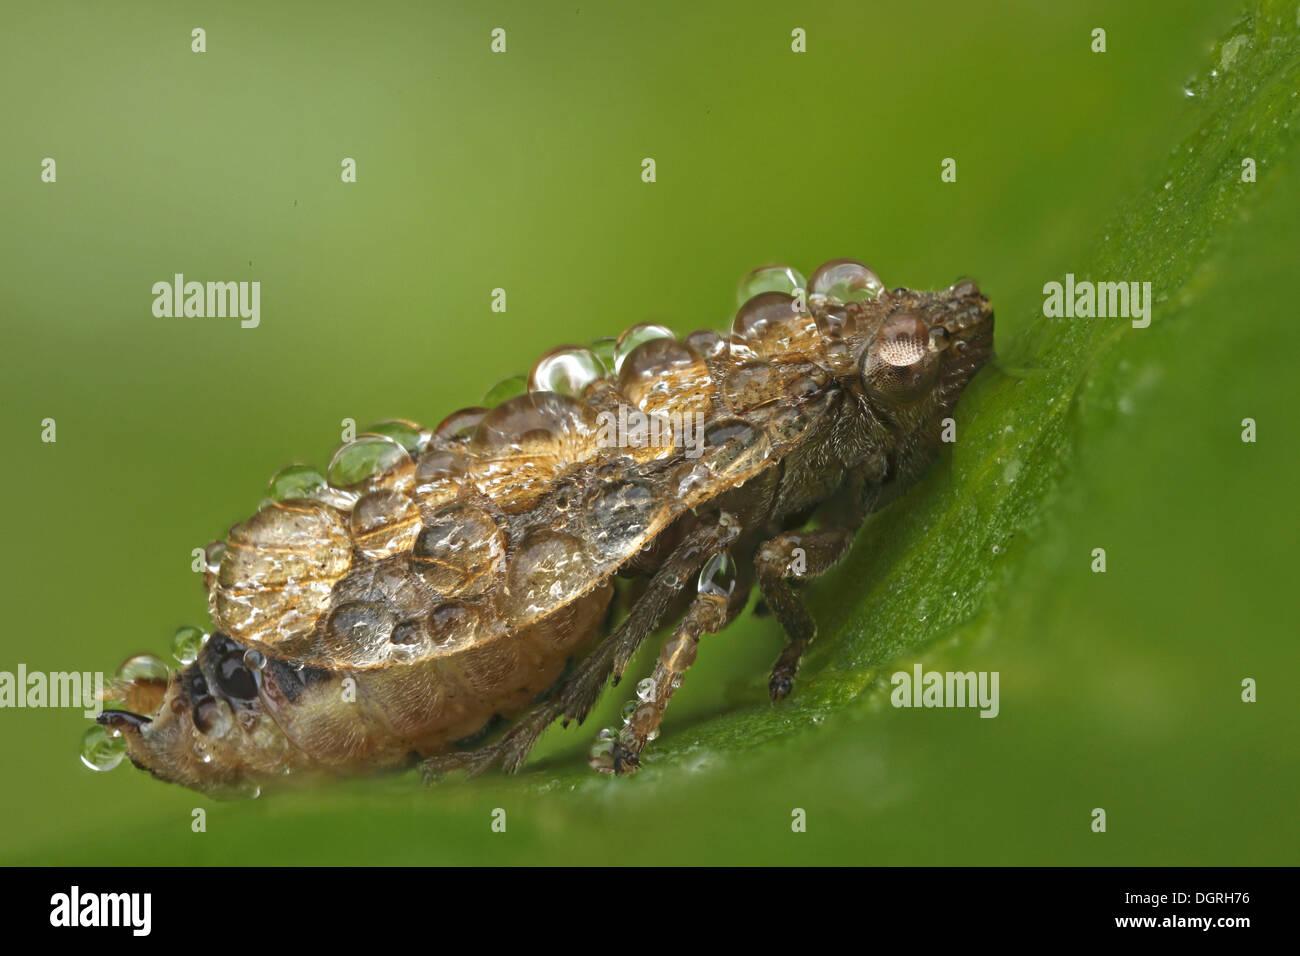 Erdzikade, Unterart (Aphrodinae spec), Kassel, Hesse Stock Photo